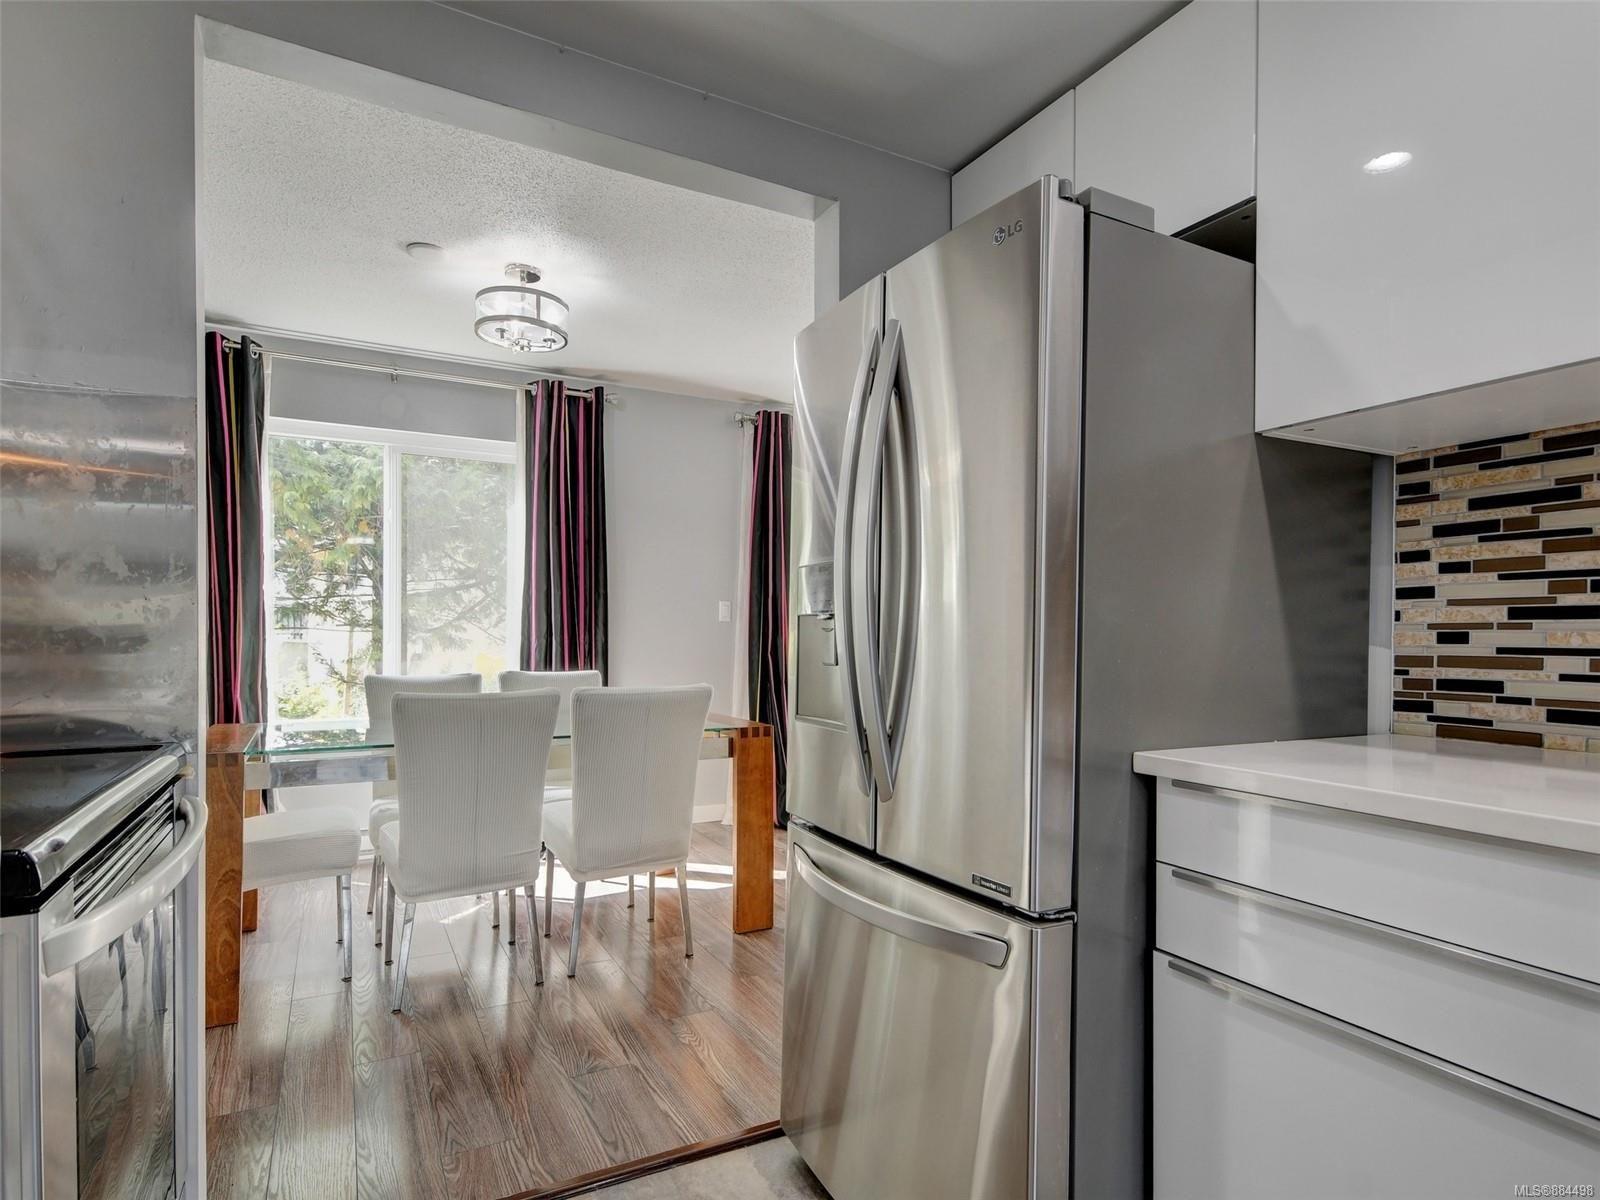 Main Photo: 533 Crossandra Cres in : SW Tillicum Row/Townhouse for sale (Saanich West)  : MLS®# 884498